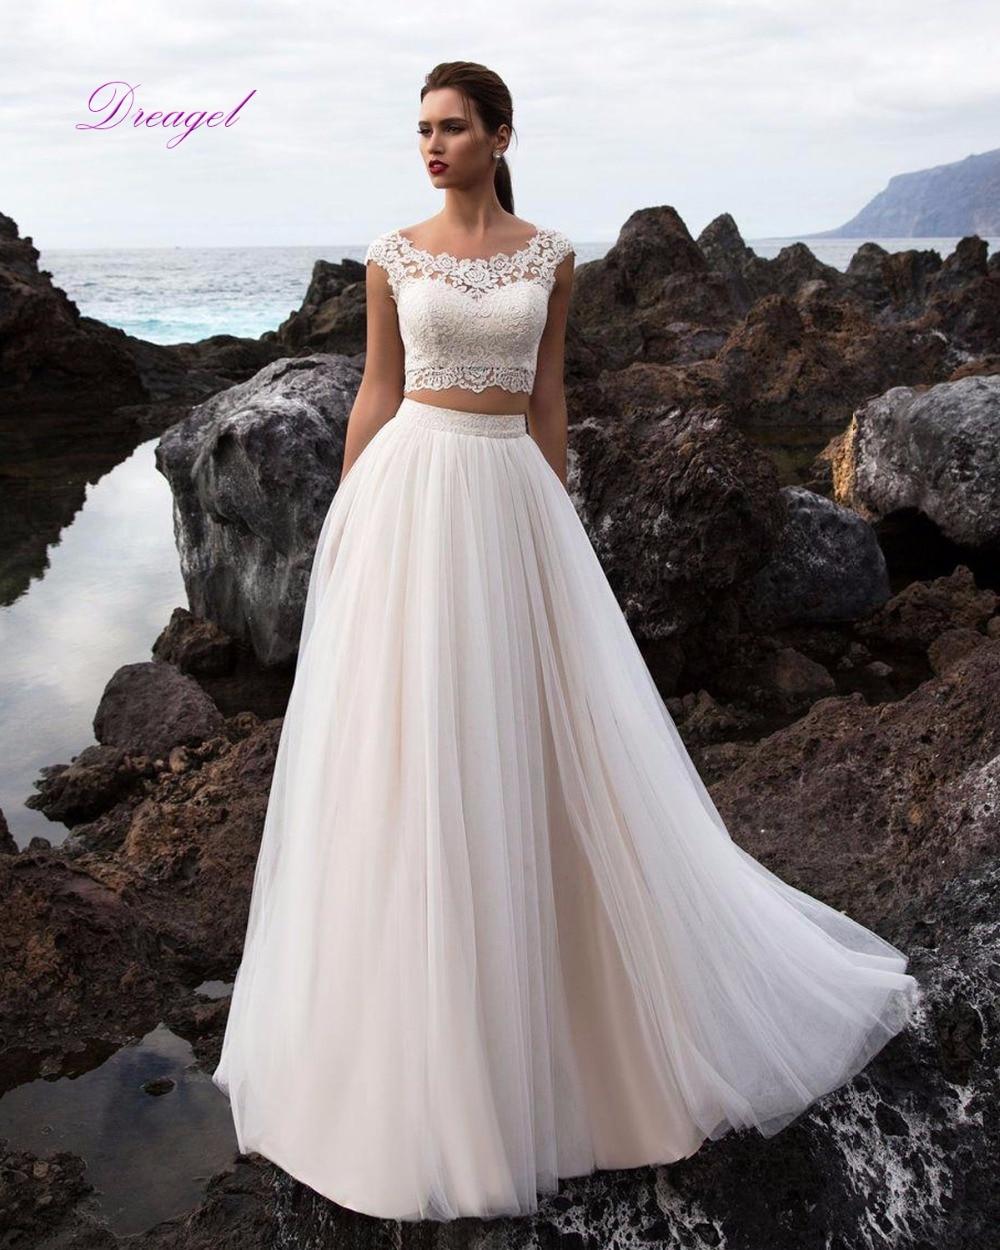 2 piece beach wedding dresses : New arrival scoop neck appliques two piece beach wedding dresses